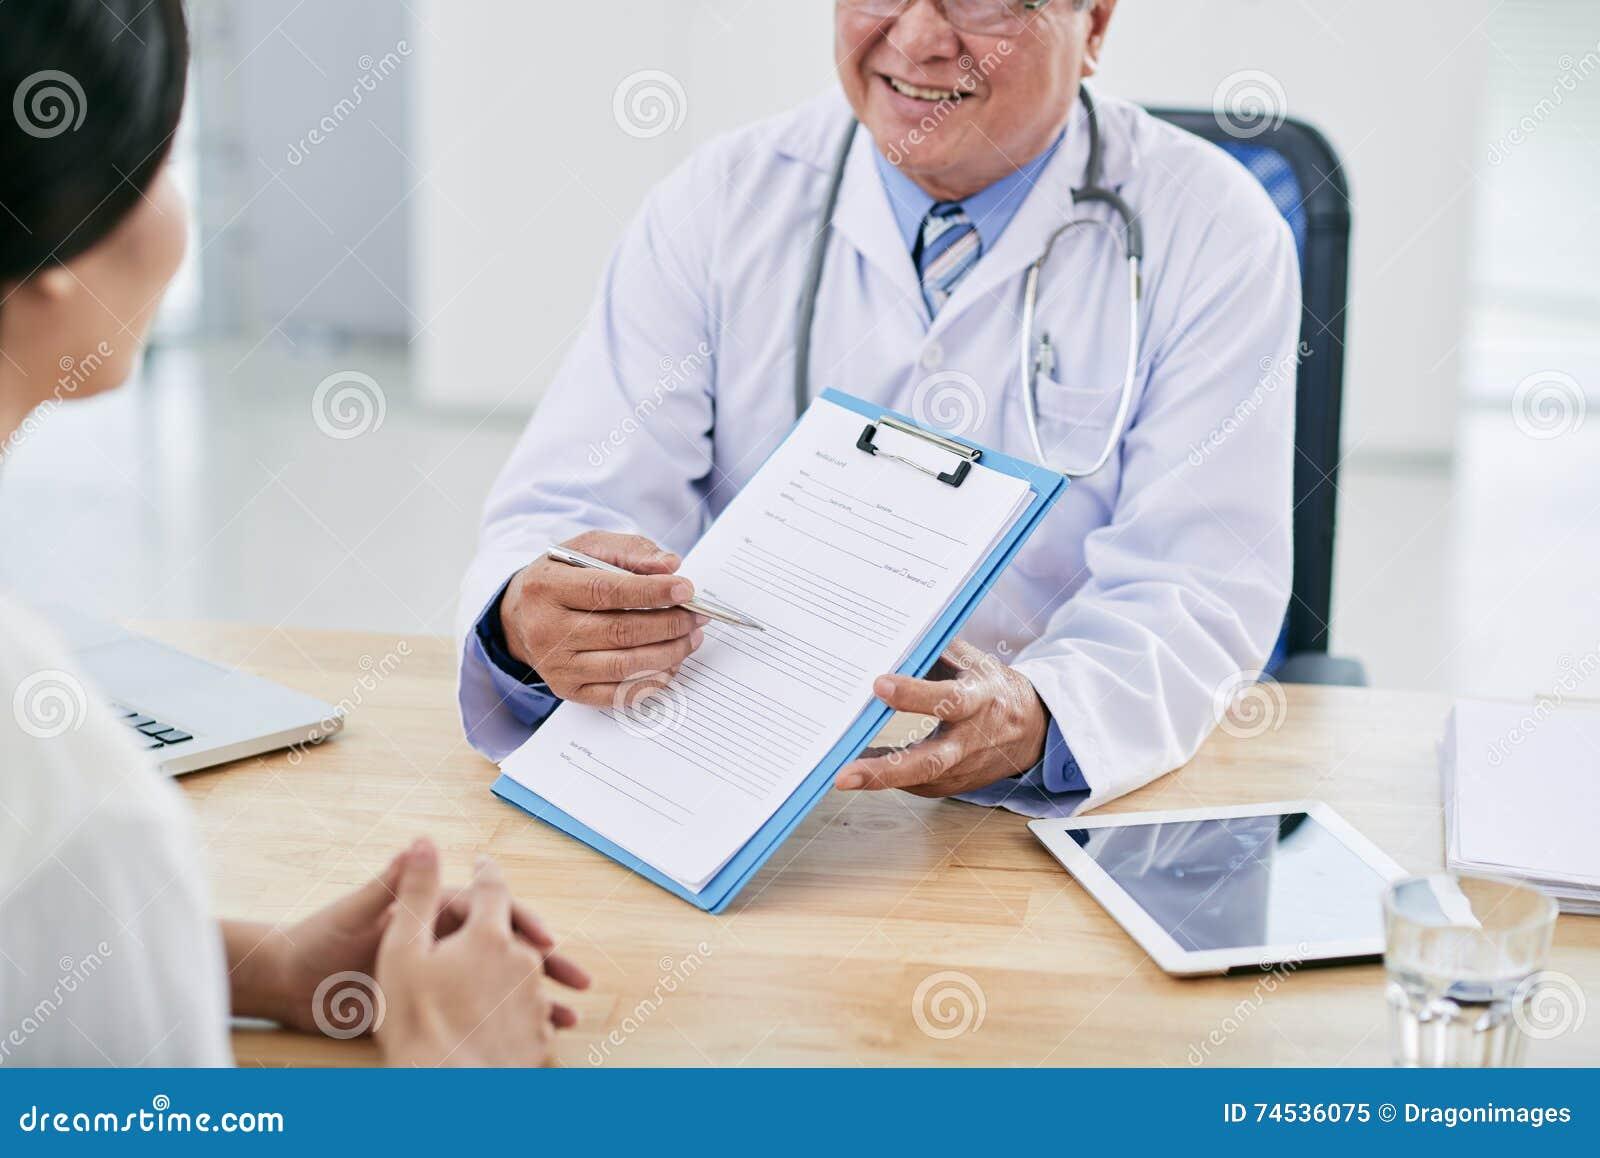 Encuesta médica